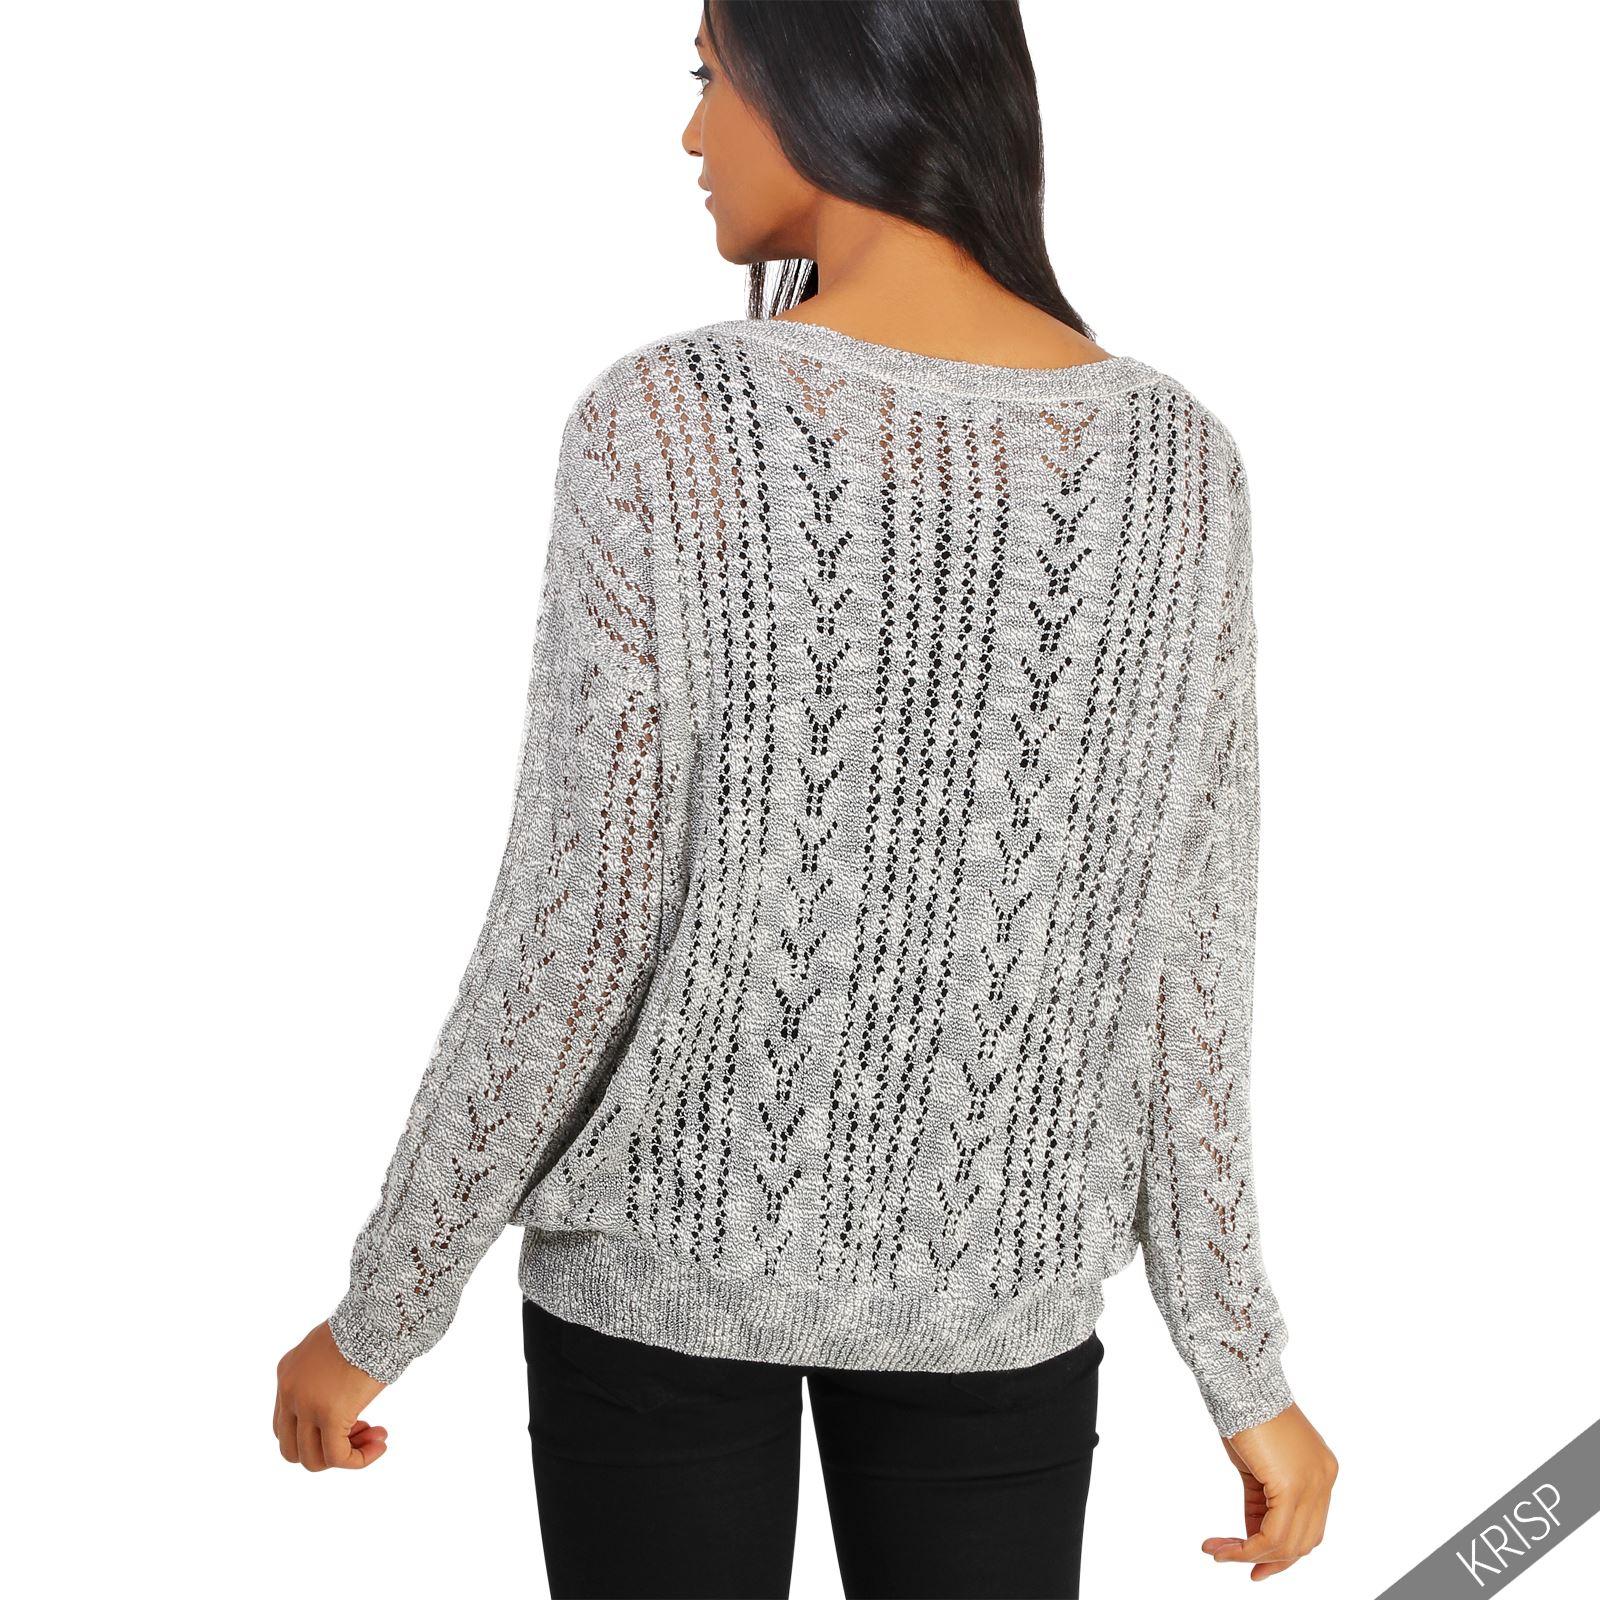 Knitting Pattern Boyfriend Jumper : Womens Ladies Chunky Knit Baggy Boyfriend Vintage Cardigan Button Sweater Jum...